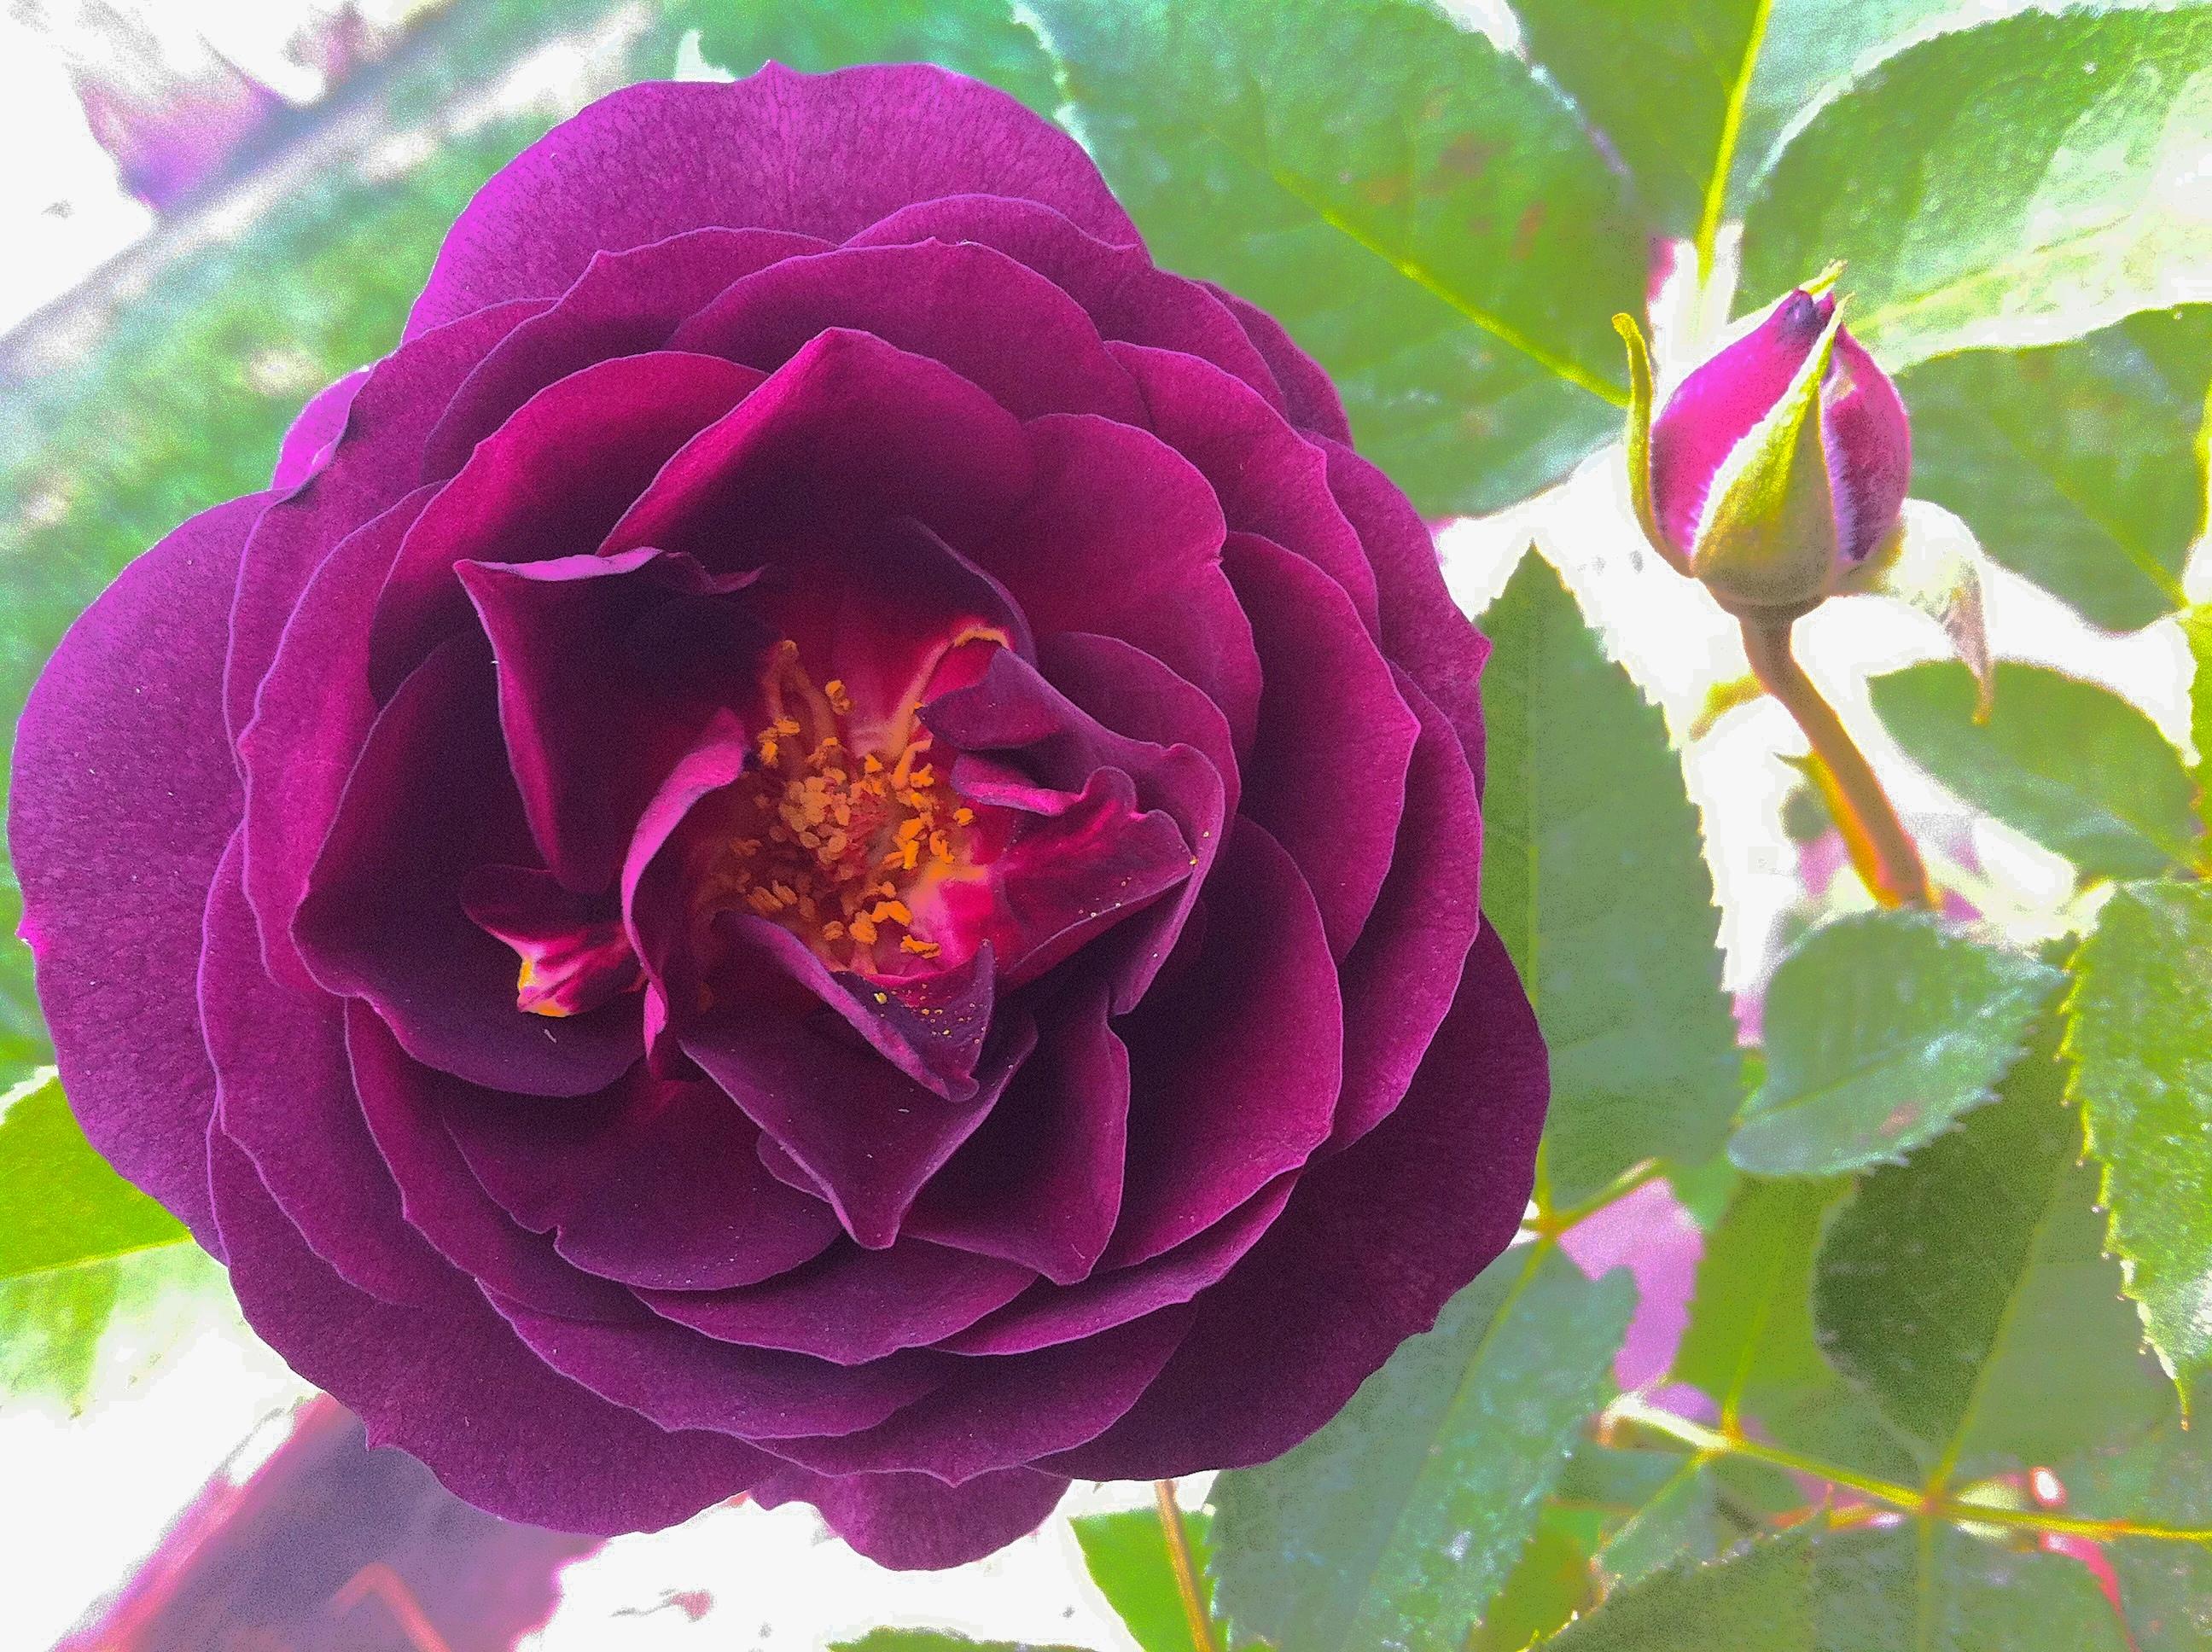 First rose again #nofilter #rose #bloom #flower